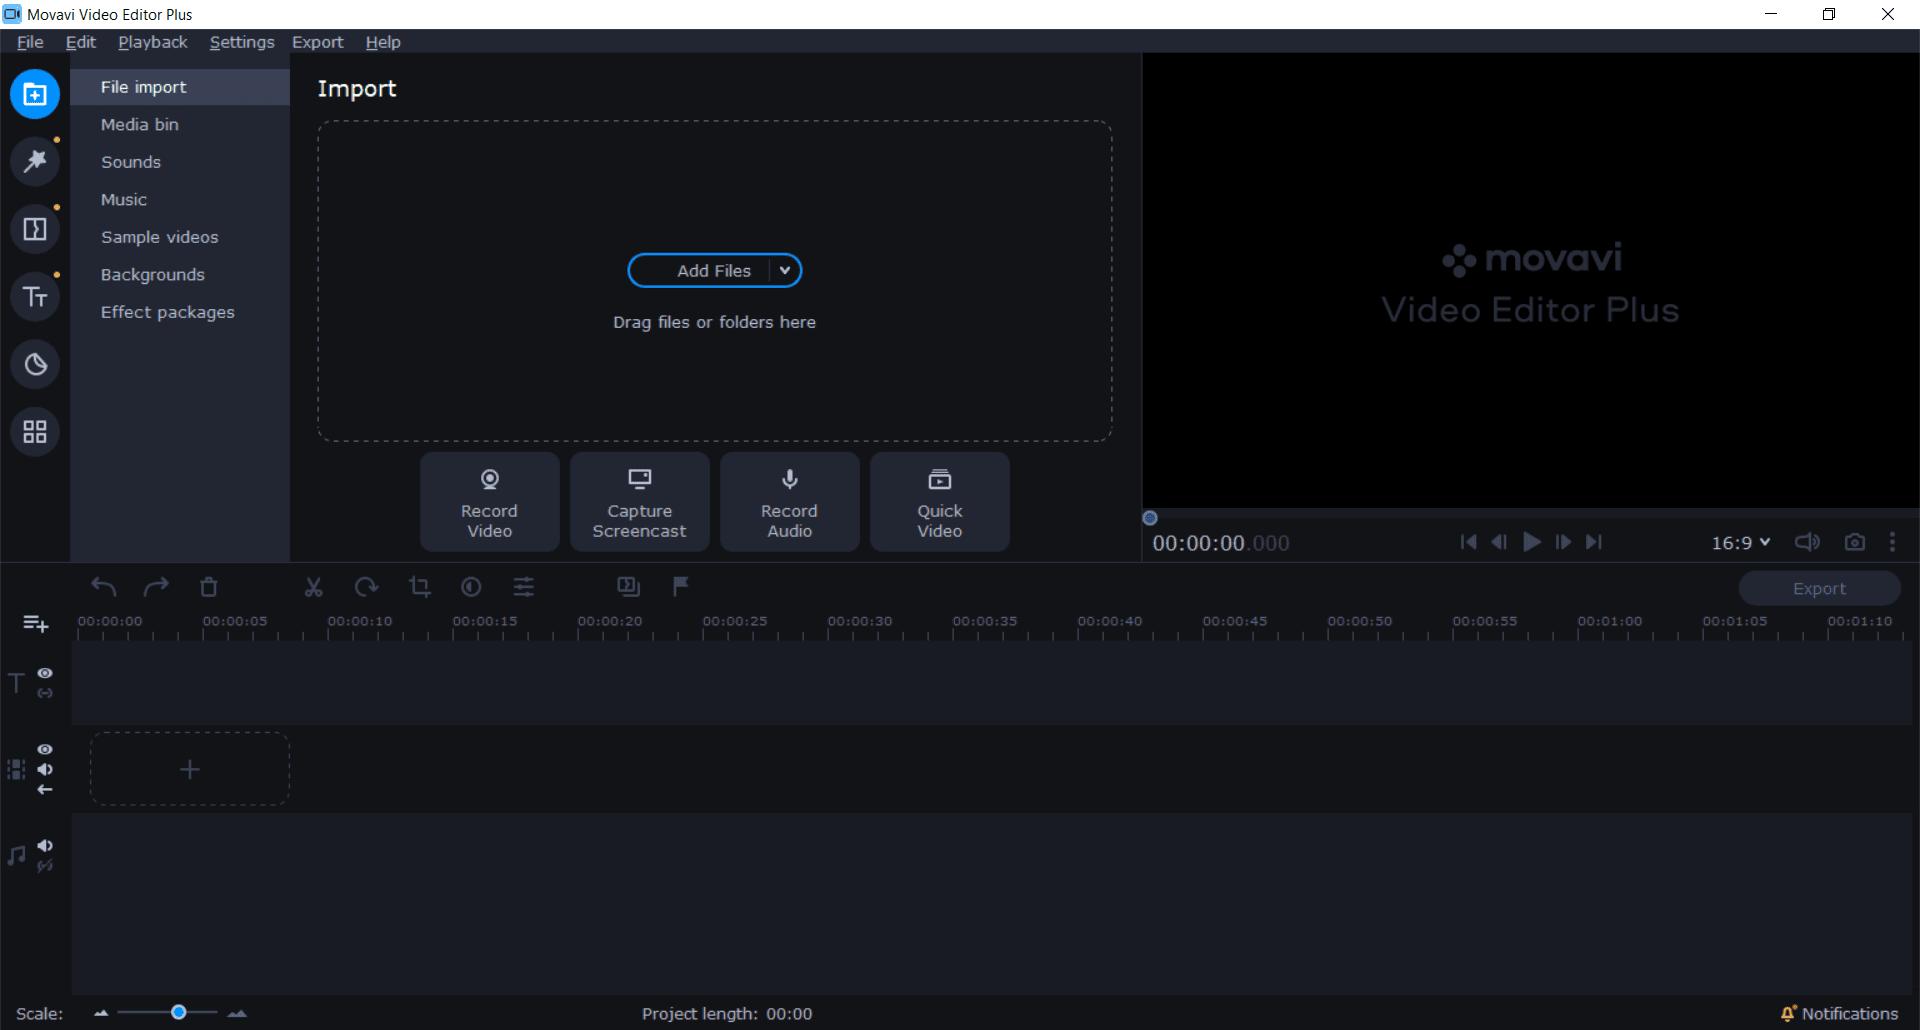 Movavi Video Editor Plus Main Interface Screenshot